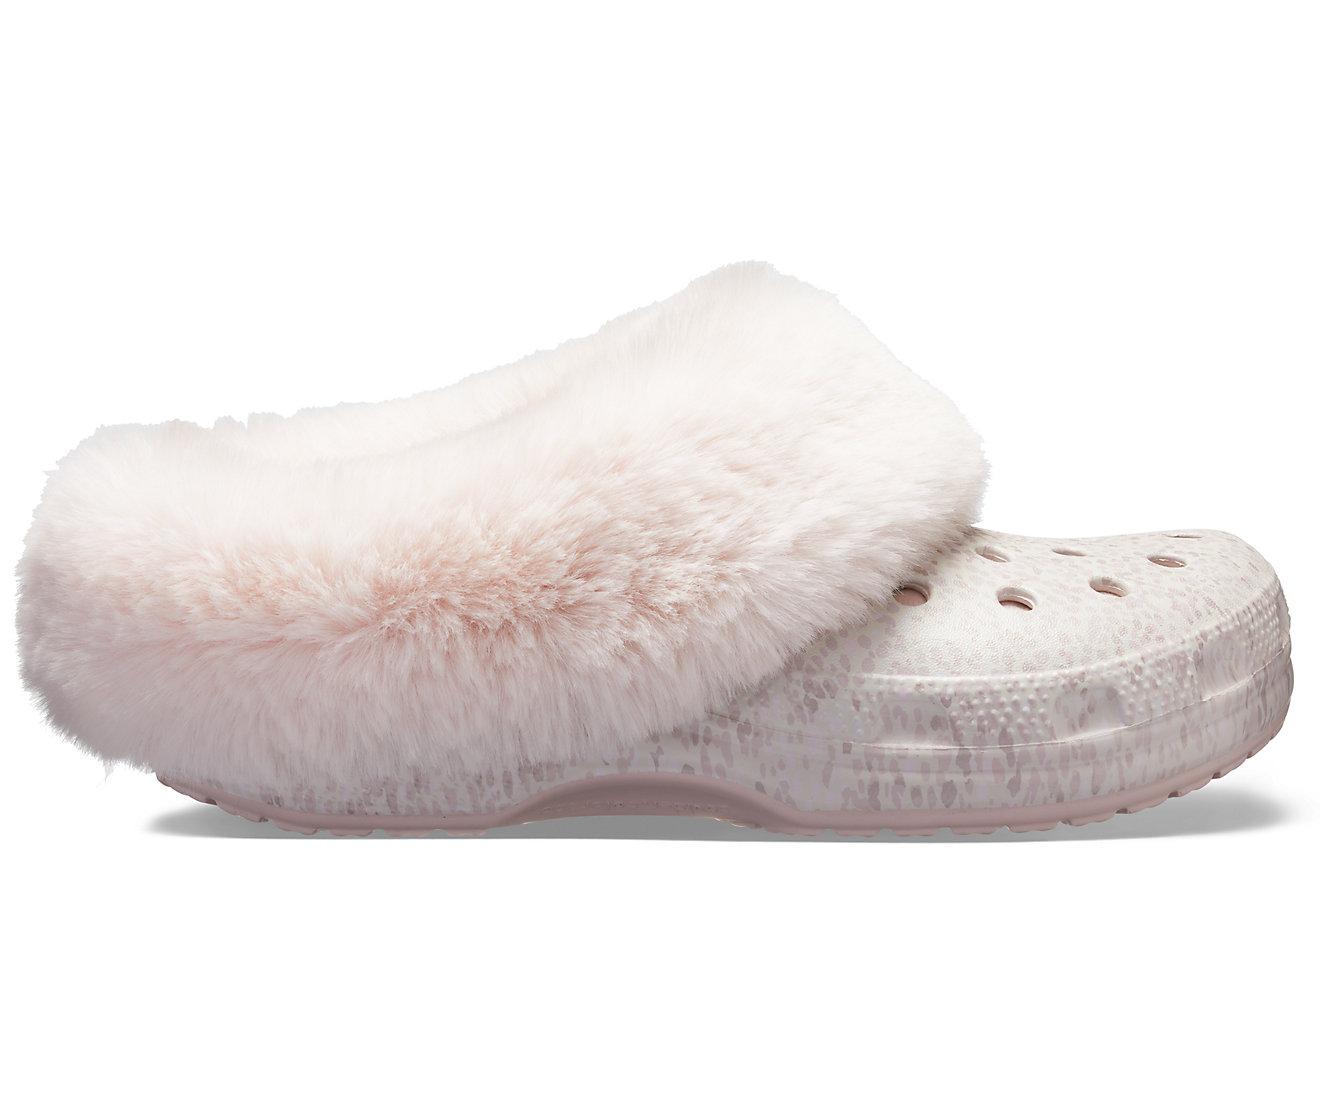 Crocs púder papucs Mammoth Luxe Radiant Clog Rose Dust - Glami.hu 337a0444d7